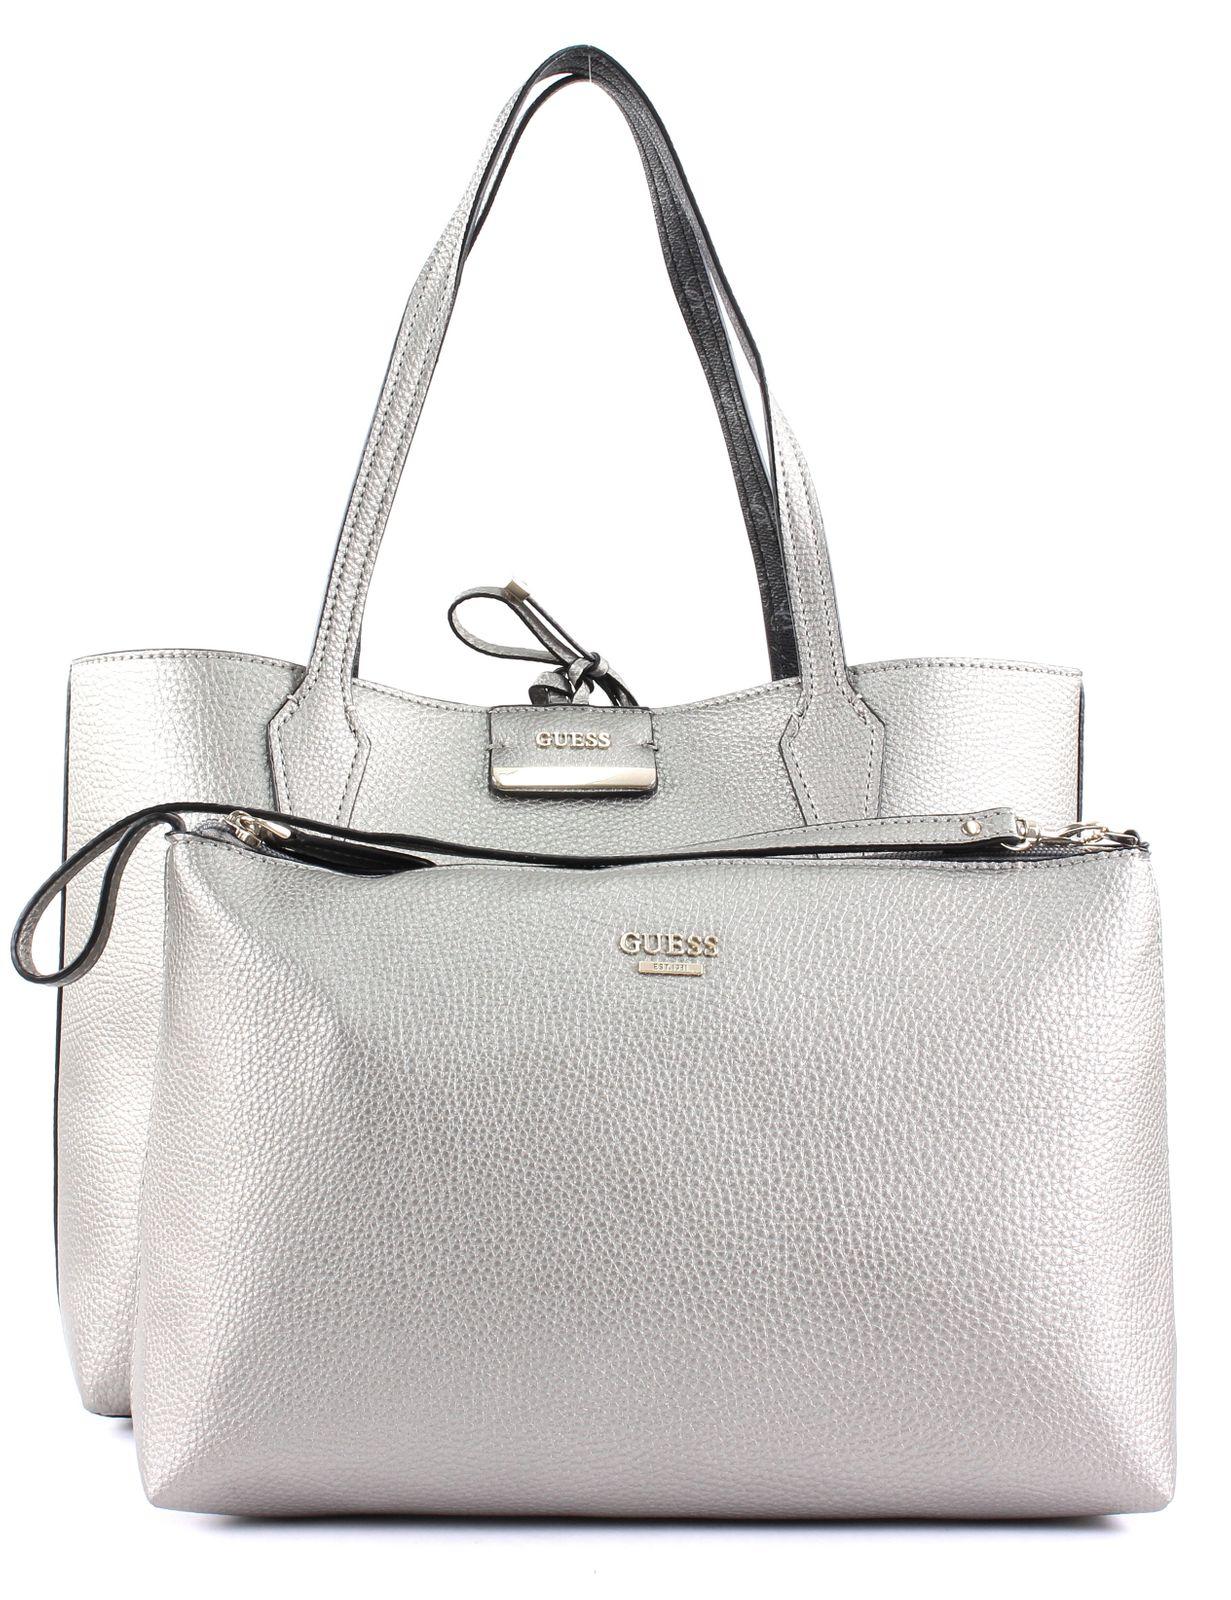 Raten Sie Tasche Guess Leder Carla Brown :